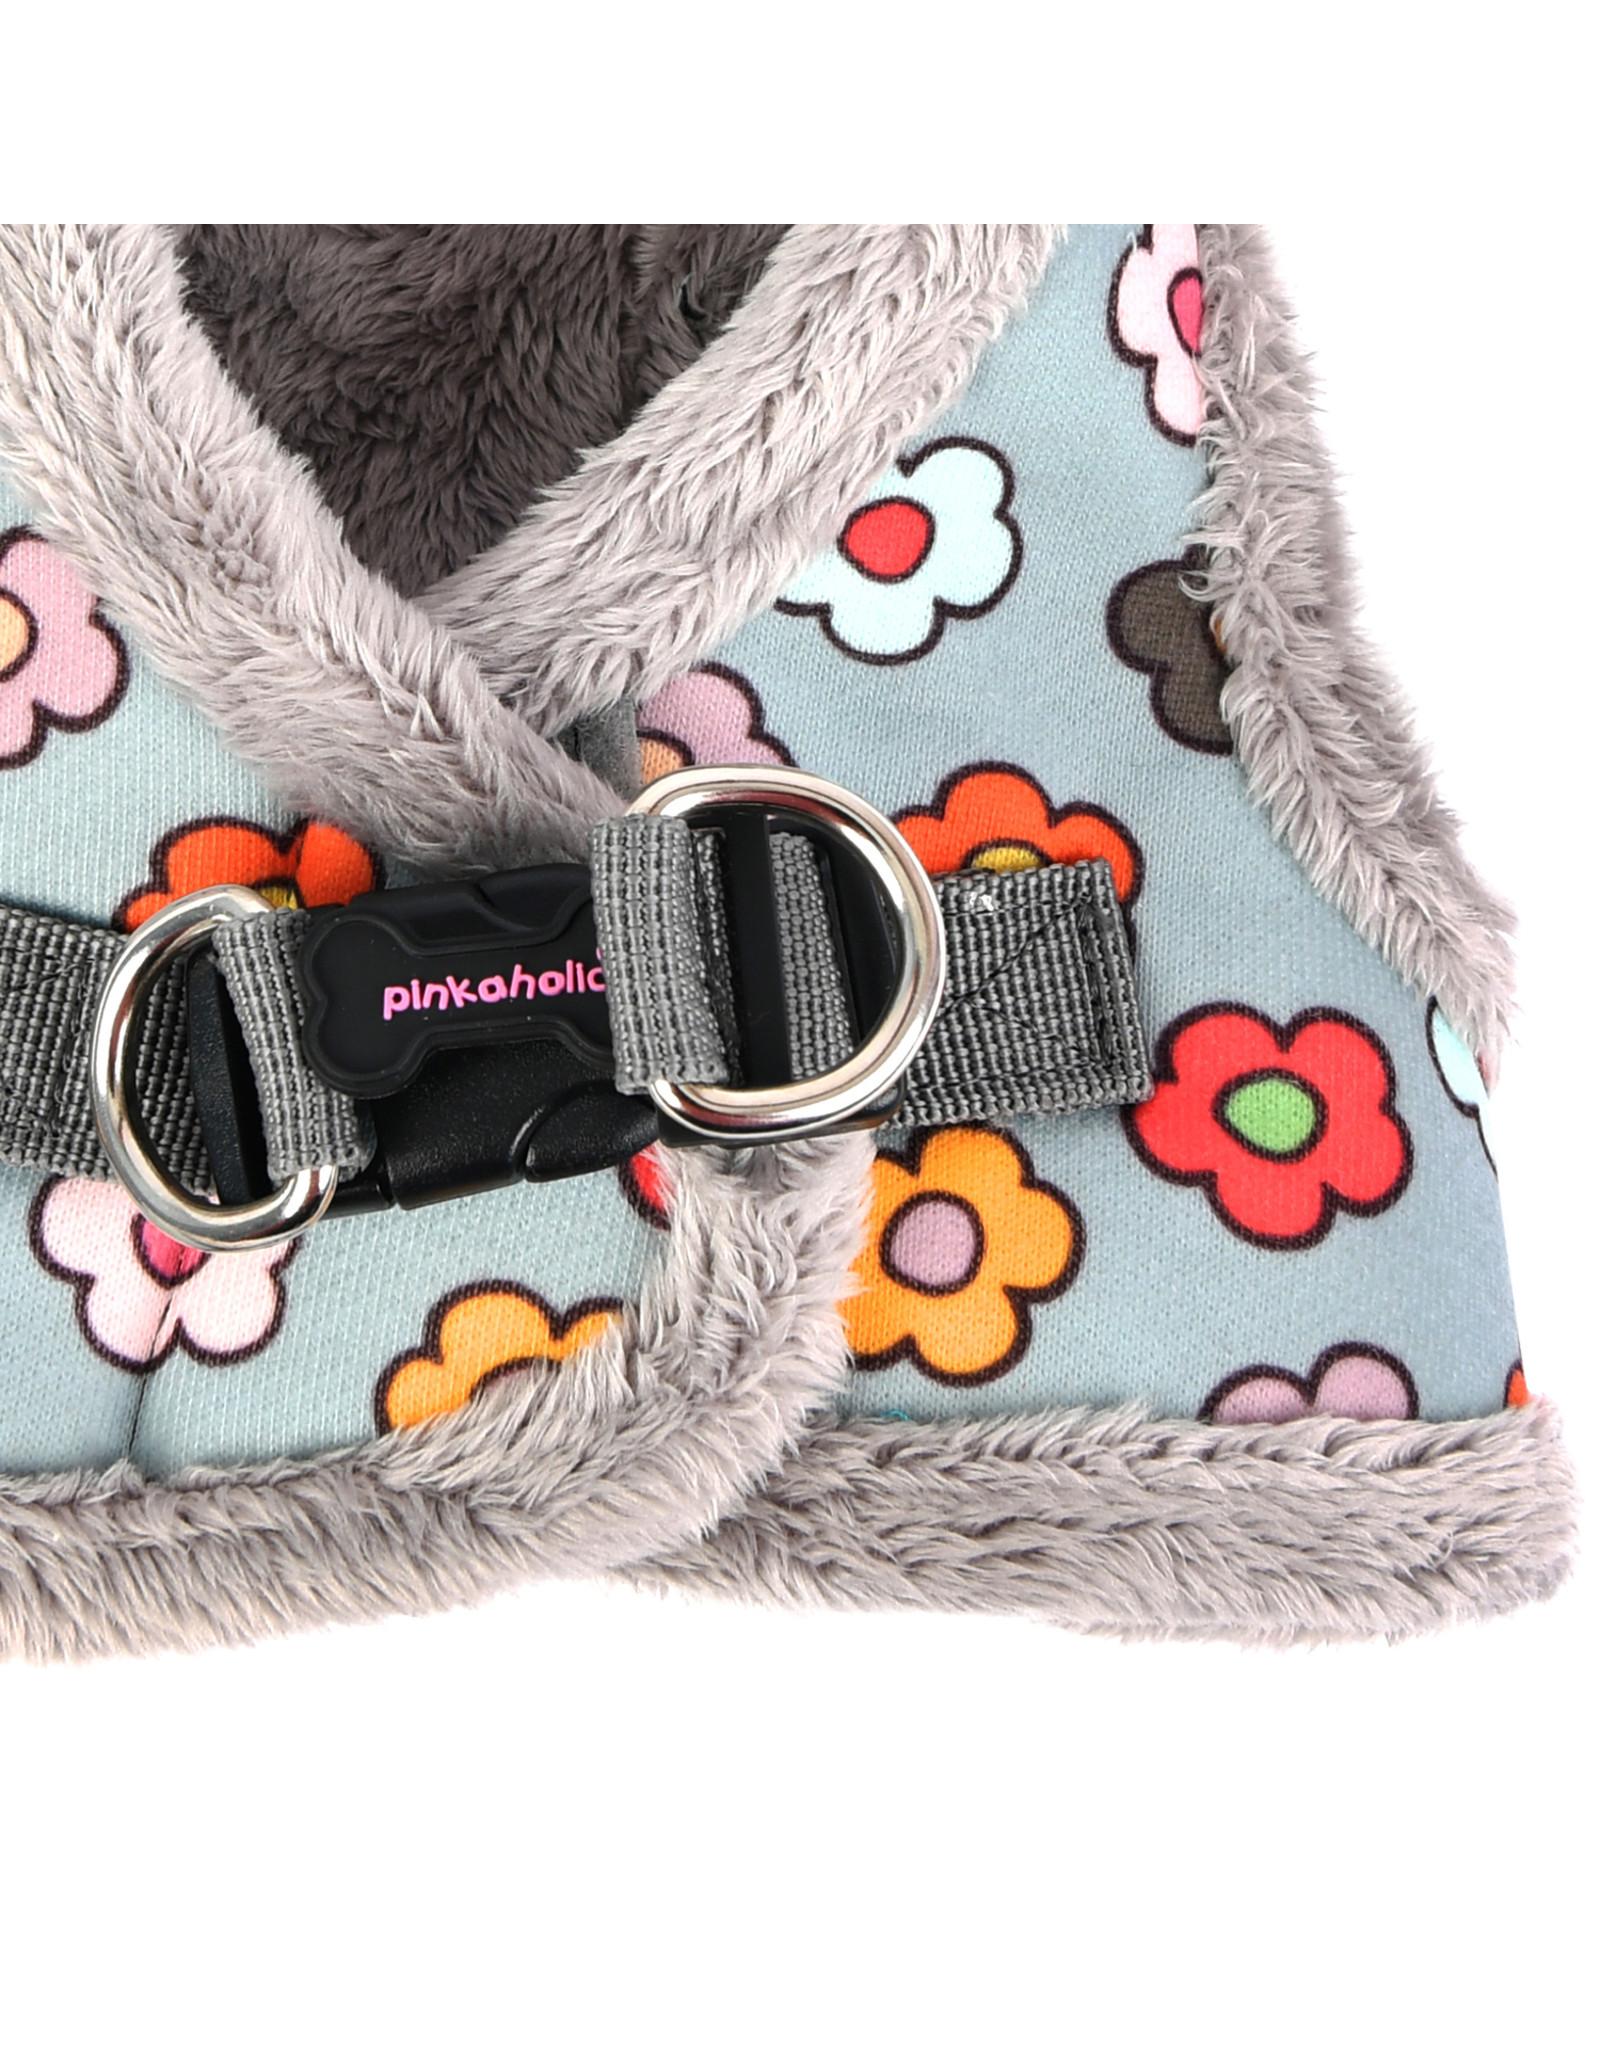 Pinkaholic Pinkaholic Aconite Pinka Harness Grey